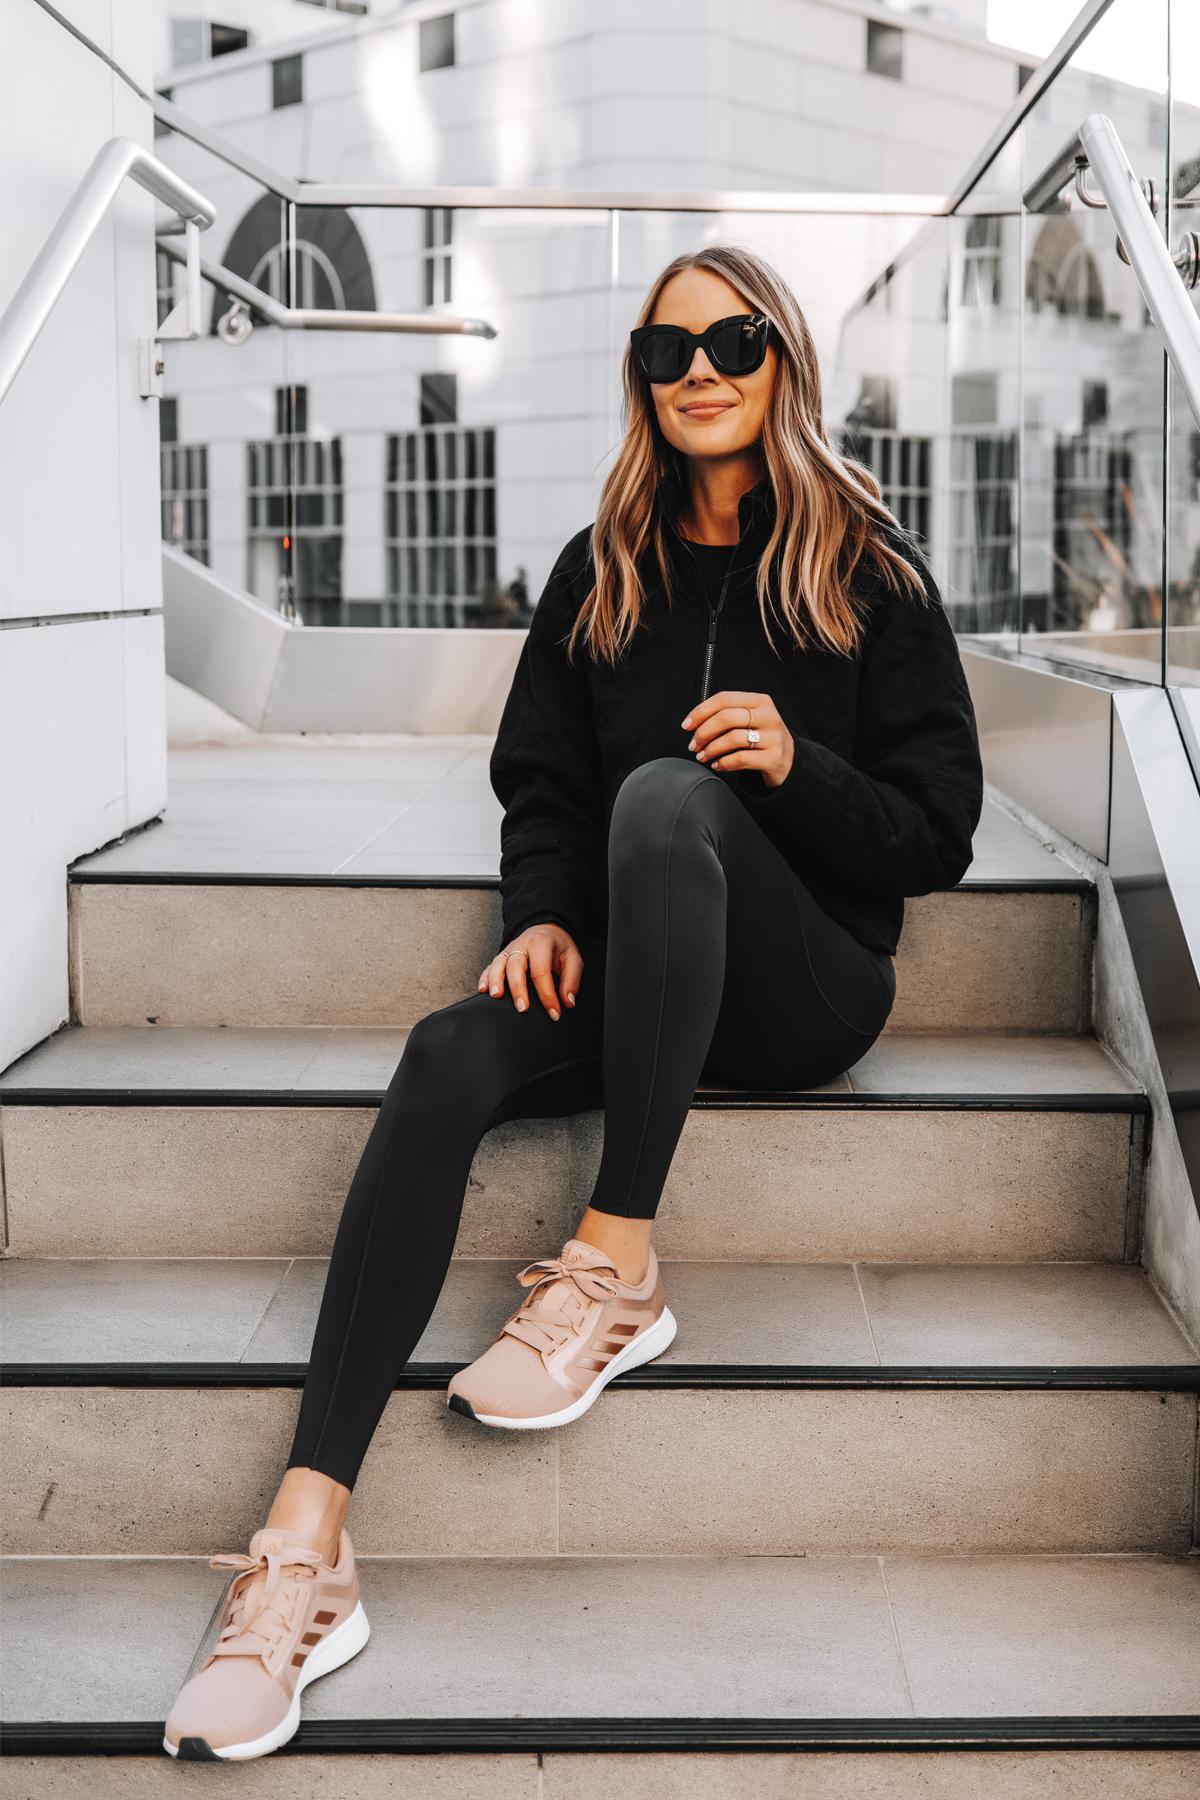 Fashion Jackson Wearing lululemon Black Outfit adidas Pink Sneakers 2